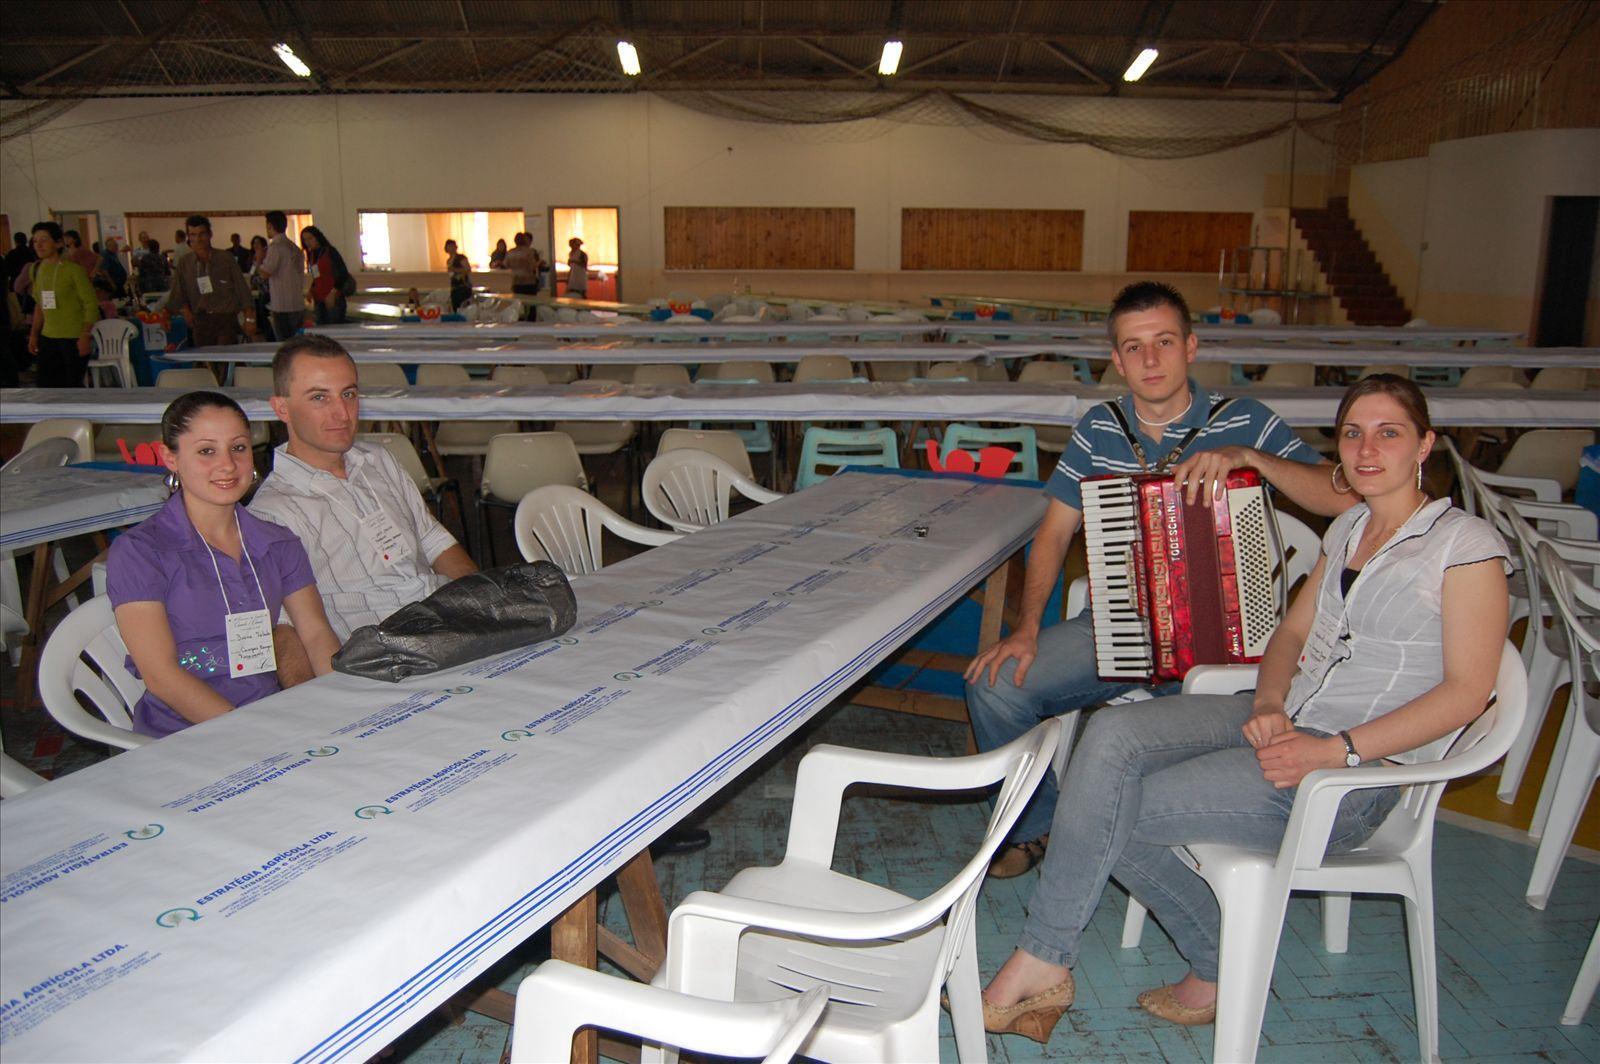 2º Encontro Família Cornelli - 11.10.2009 (86)_0